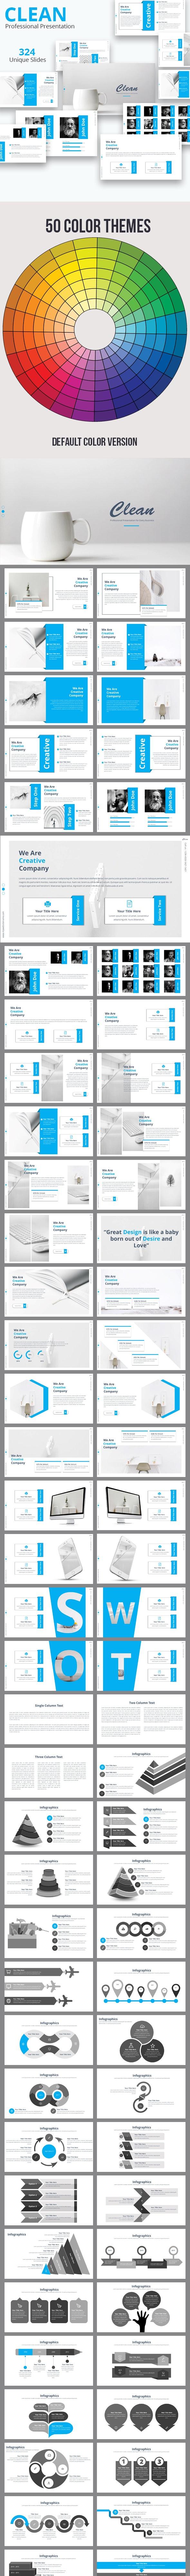 Clean Premium Google Slides Template - Google Slides Presentation Templates